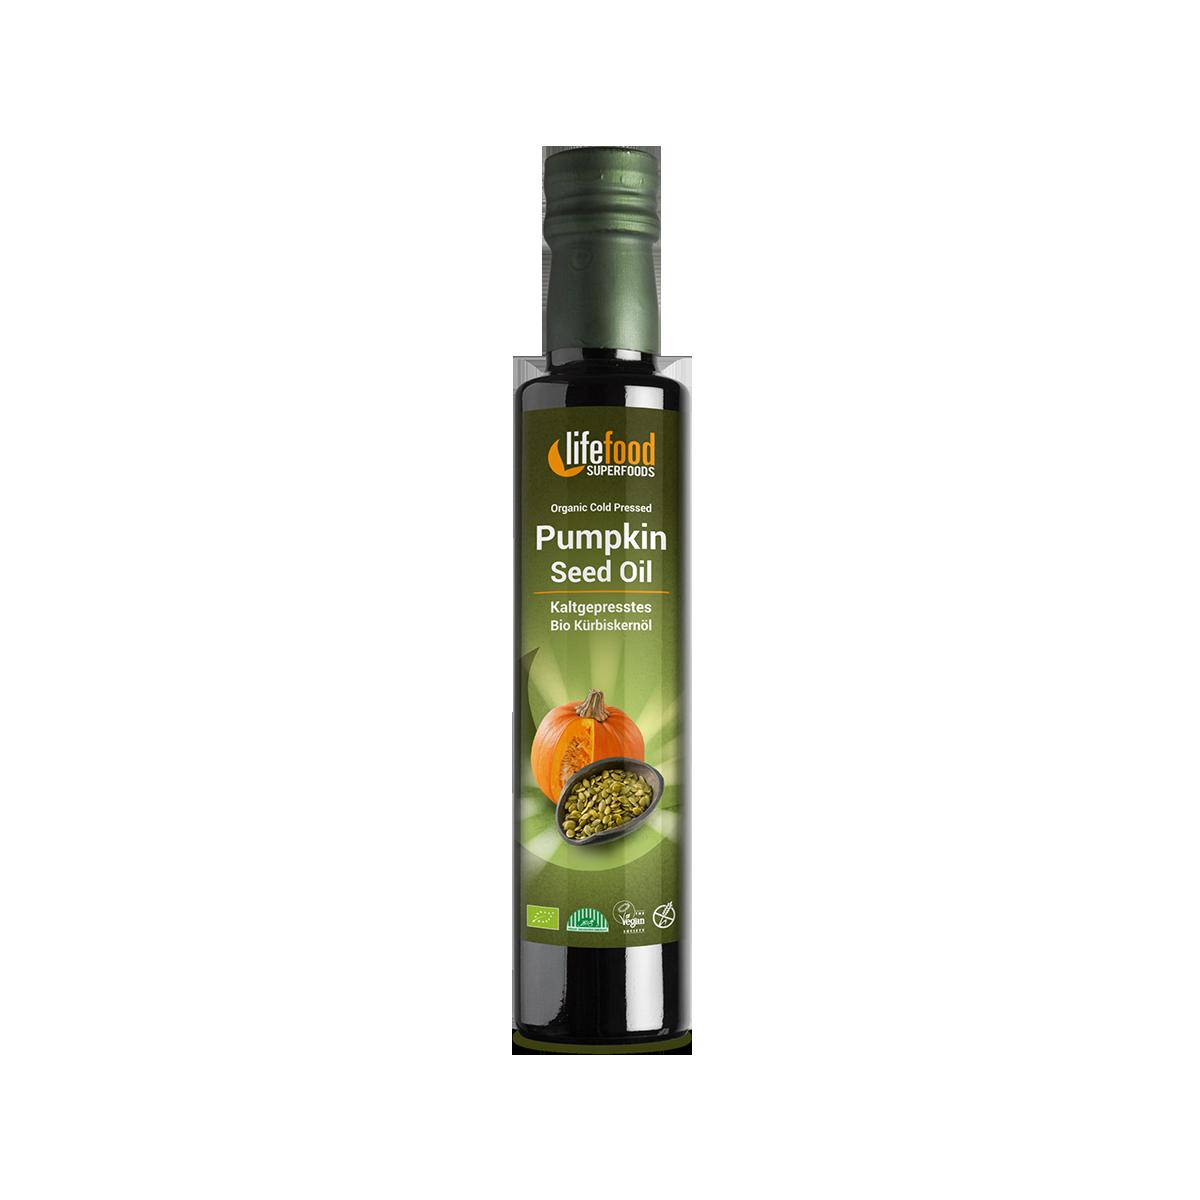 Lifefood Cold pressed Pumpkin Oil